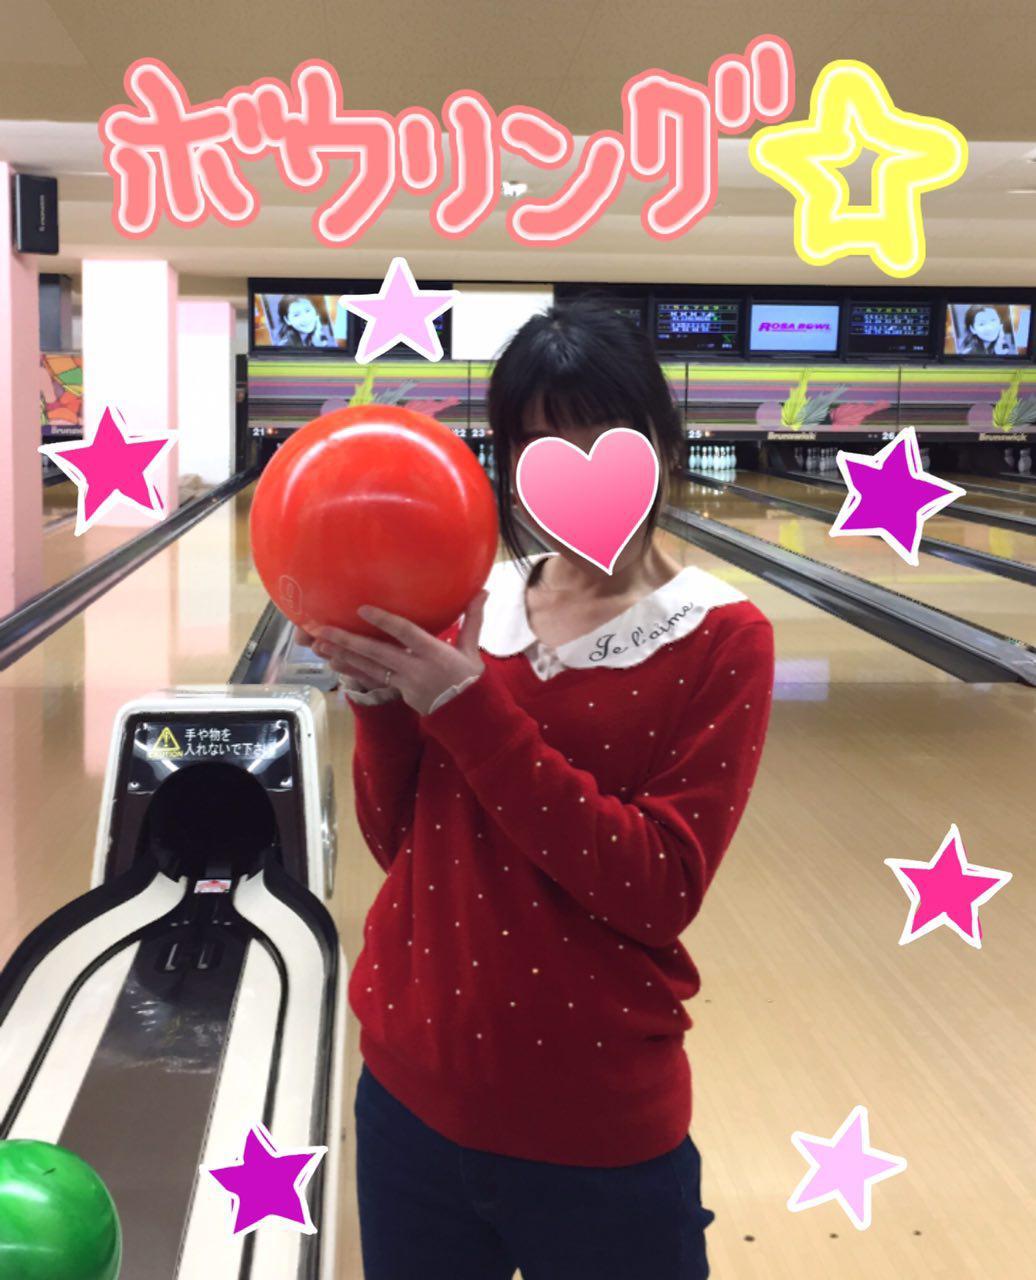 photo_2017-02-07_22-10-47.jpg